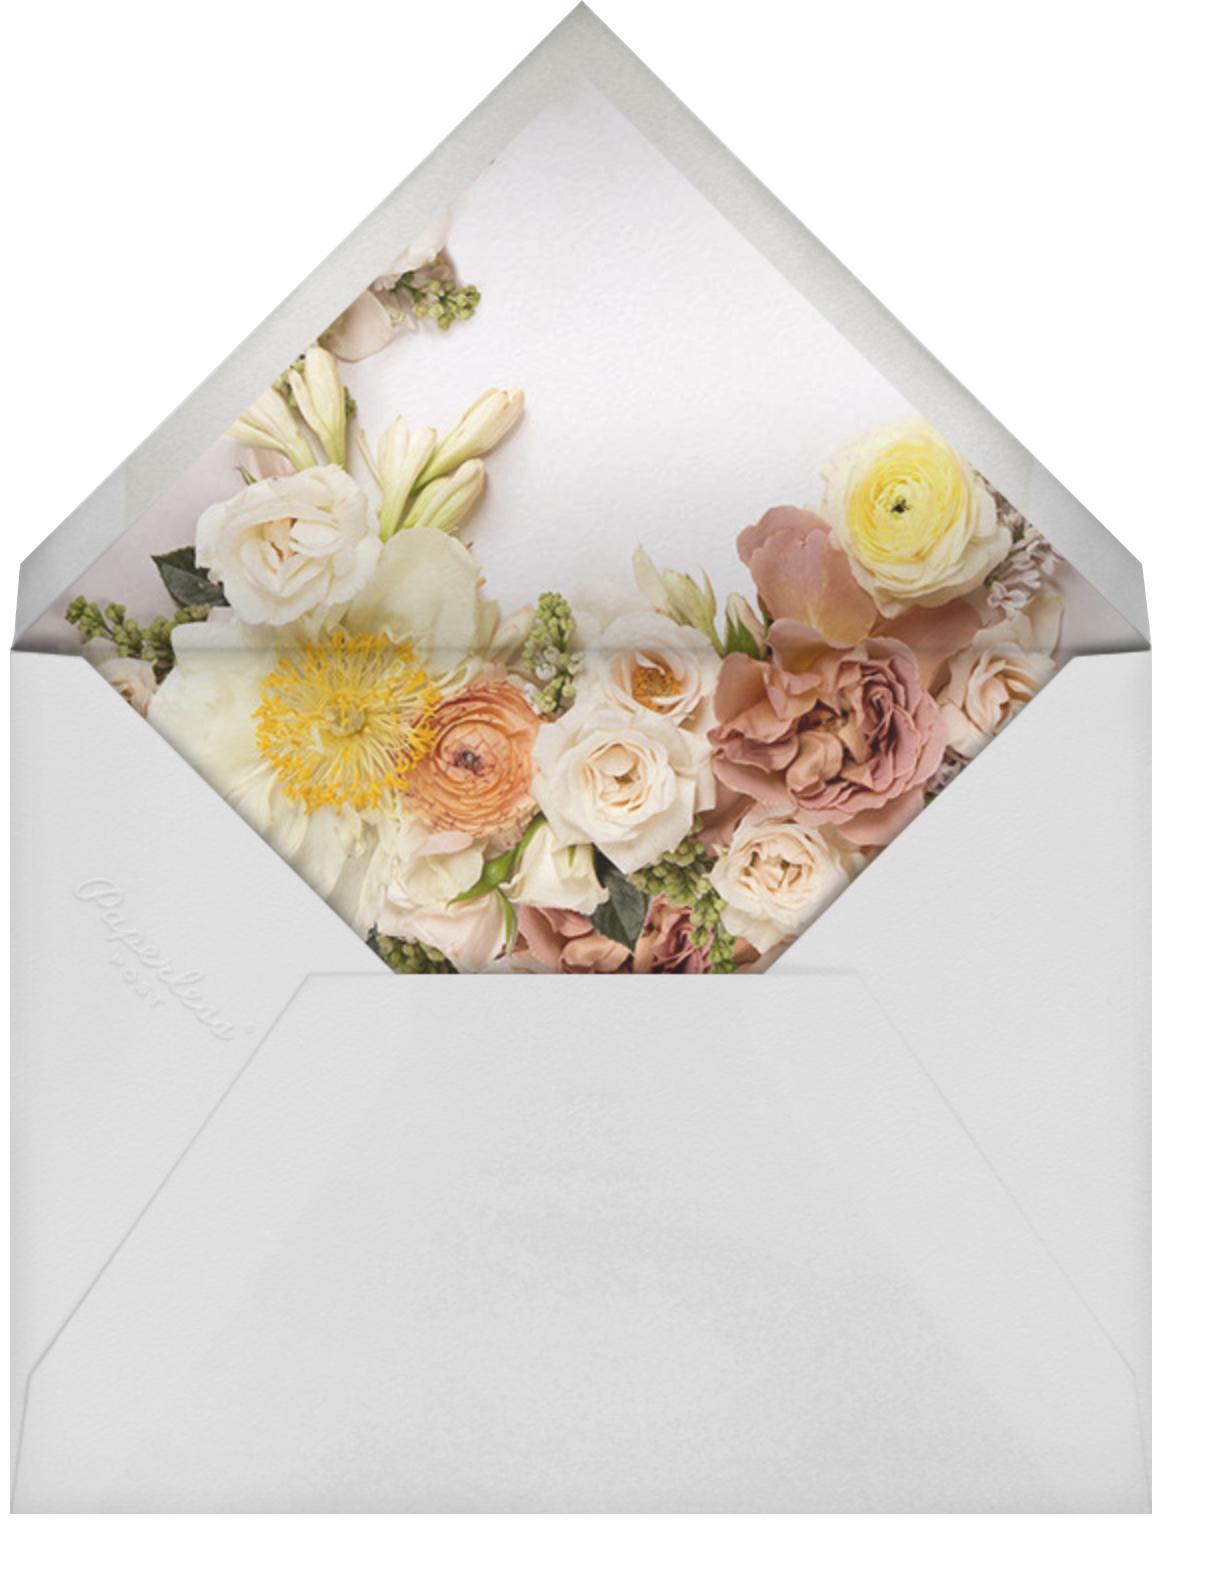 Pluviôse Photo - Putnam & Putnam - Valentine's Day - envelope back